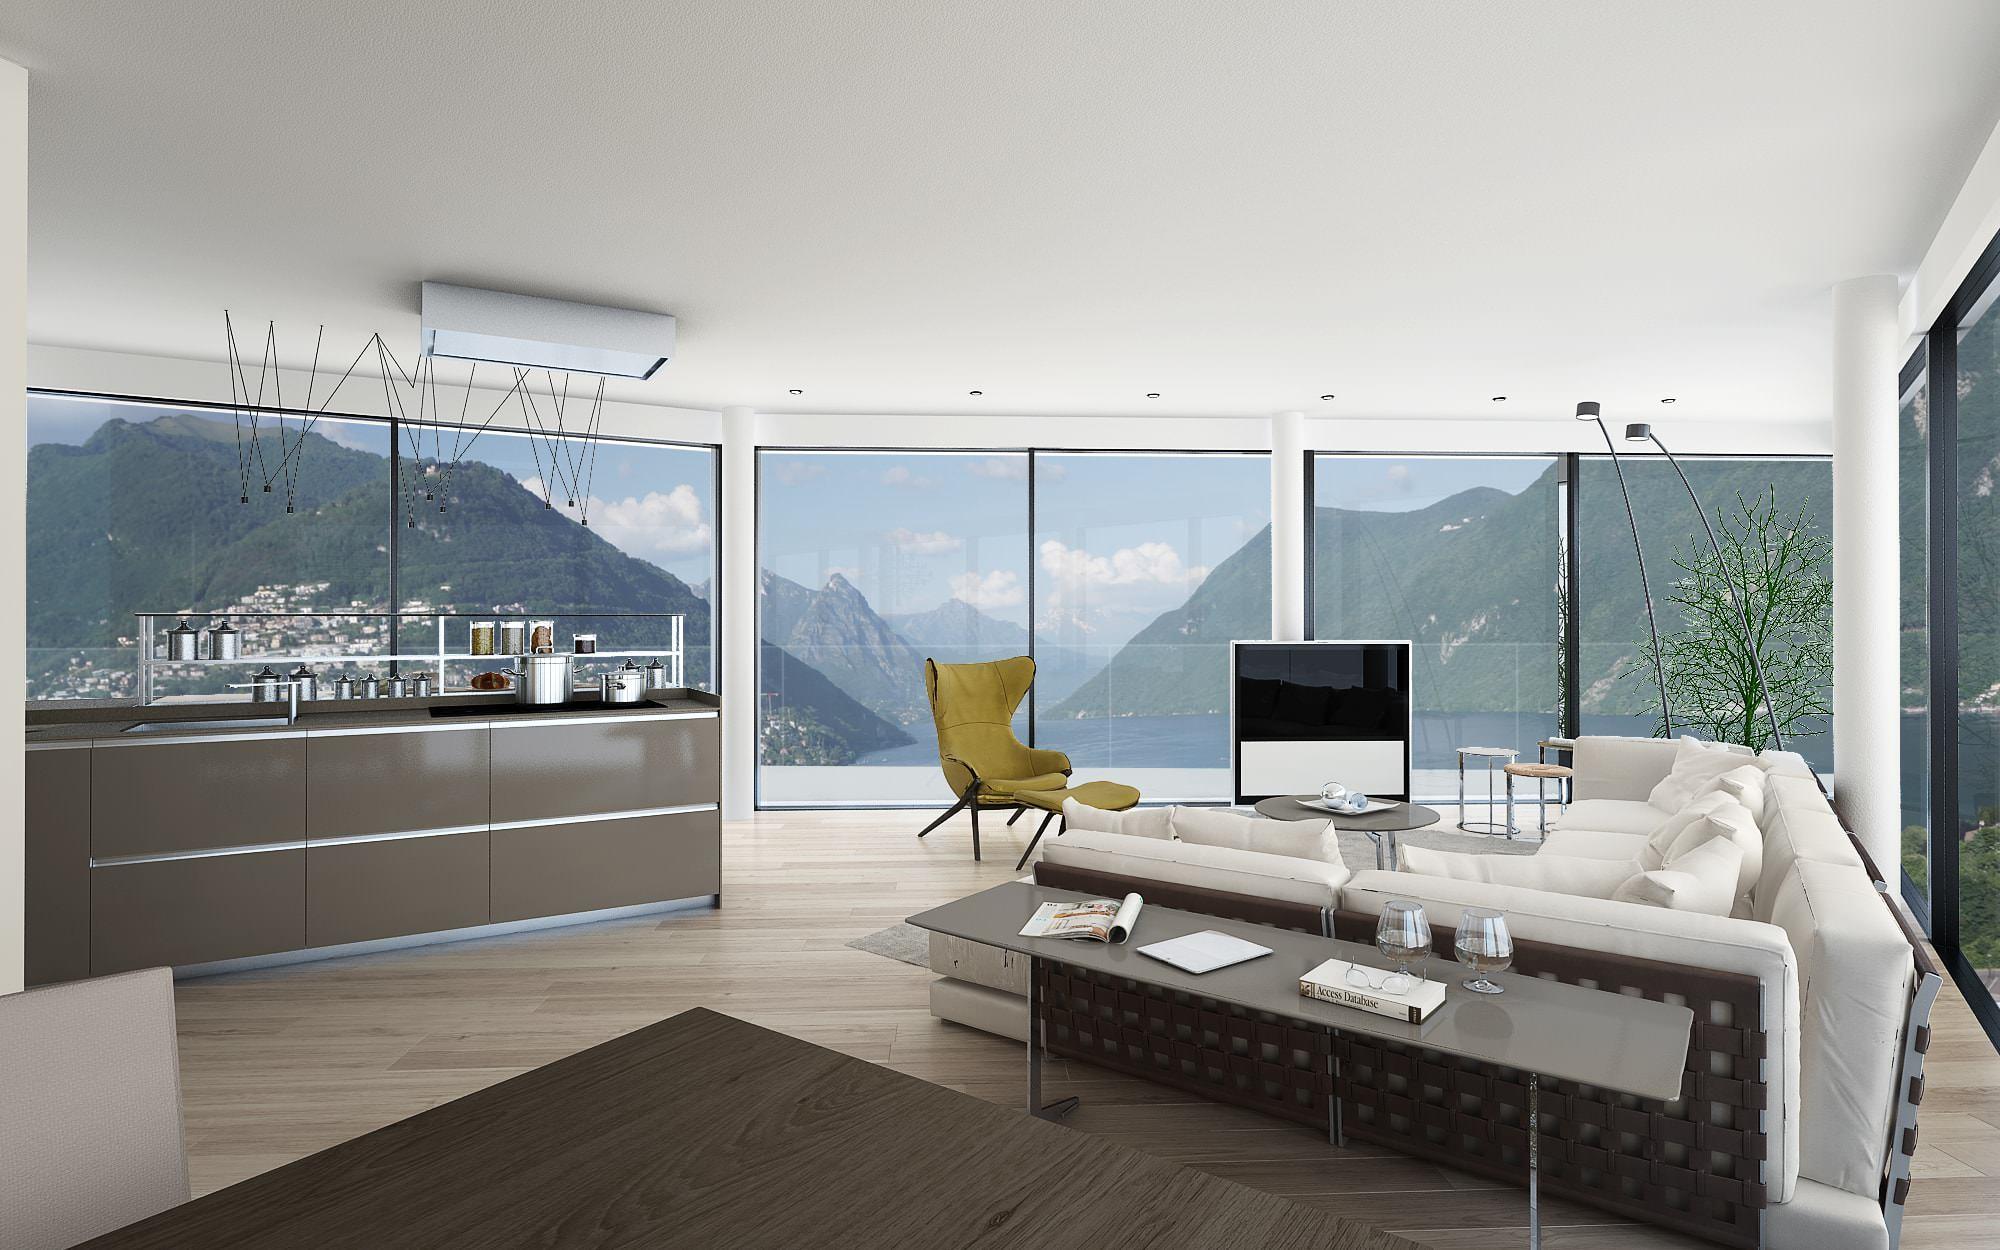 Panorama attico innovativo Lugano Ticino Svizzera